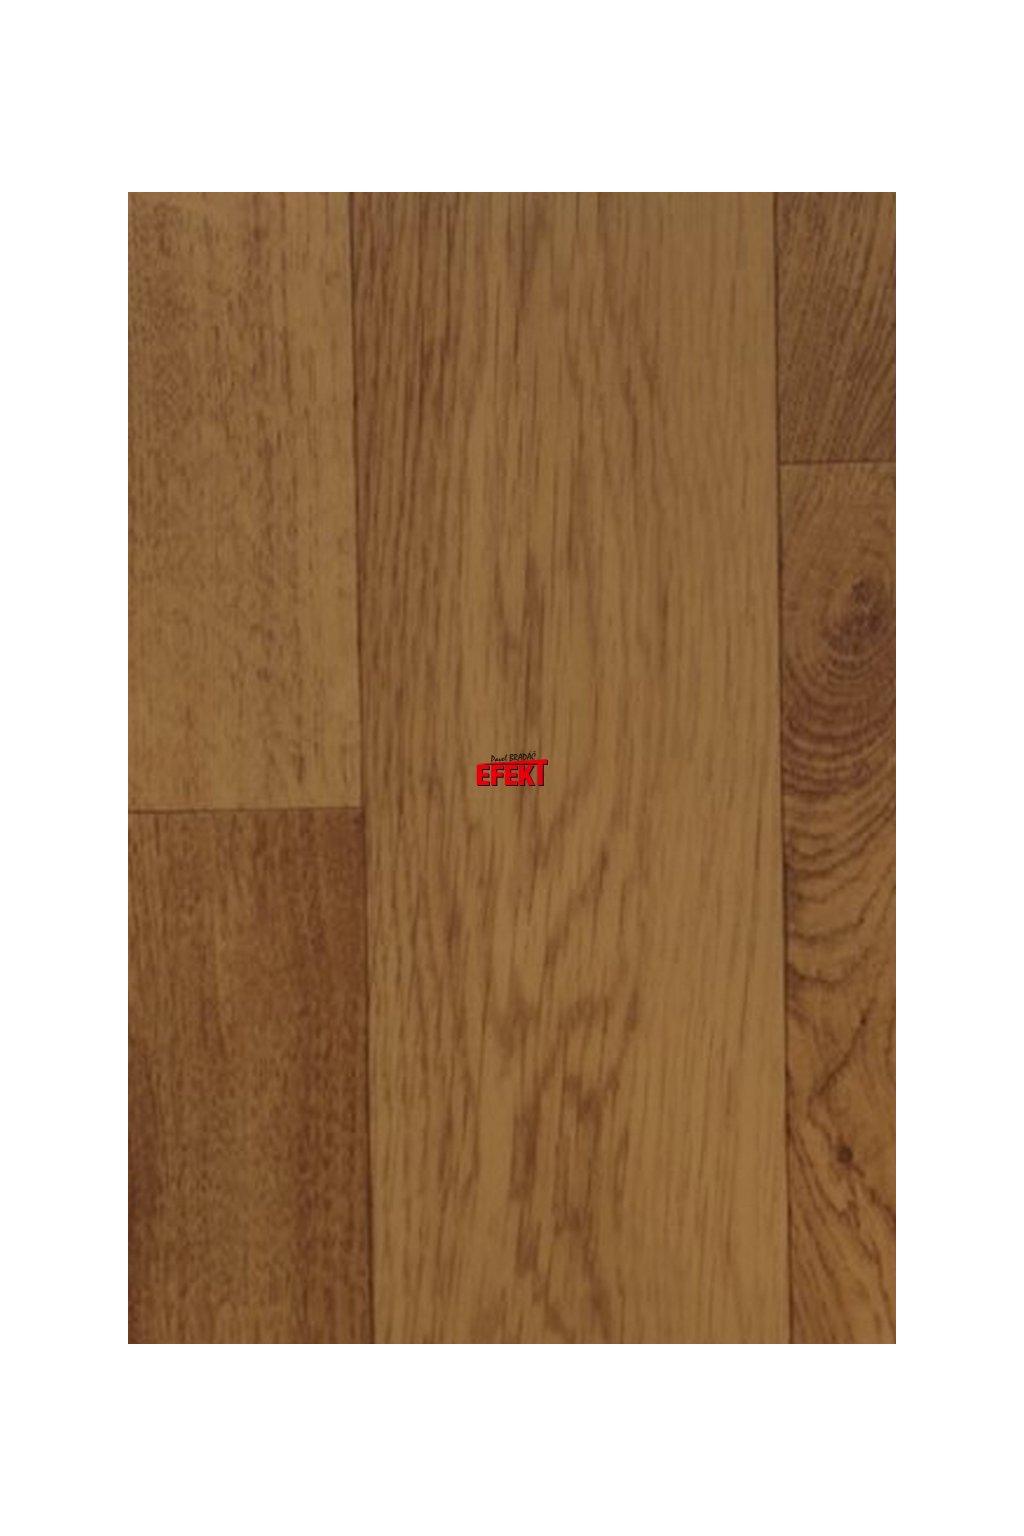 Expoline-Oak Plank 026D